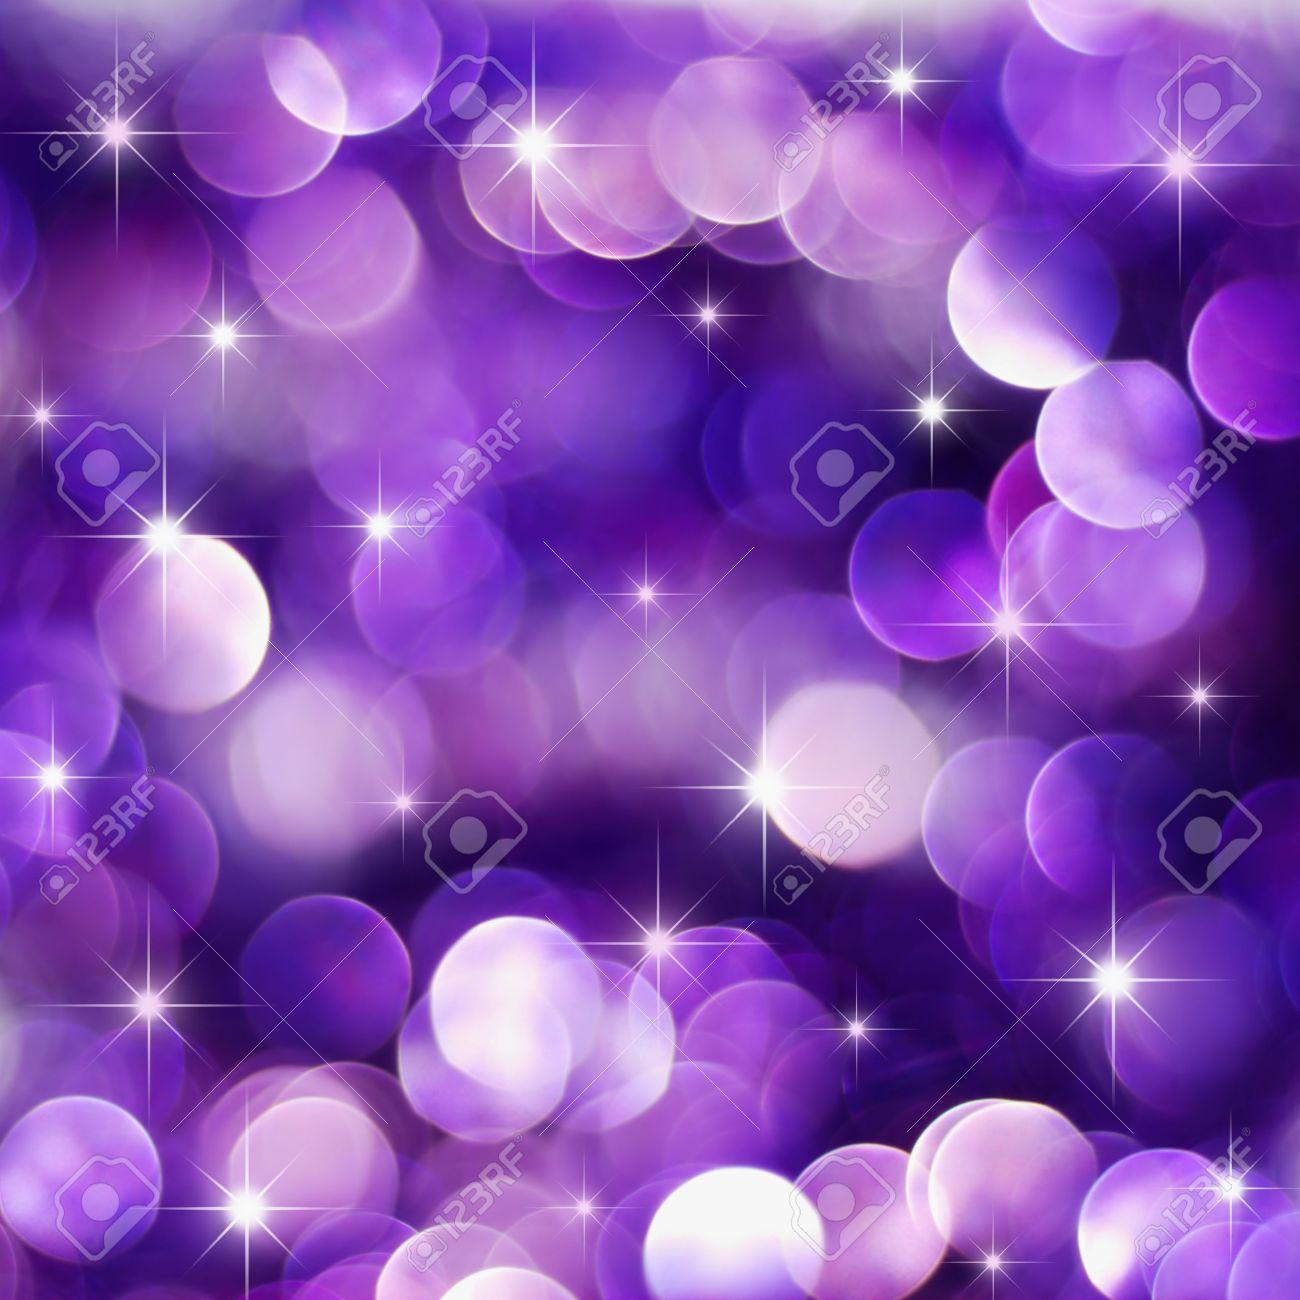 Christmas deep purple lights background with little stars Stock Photo - 5432670